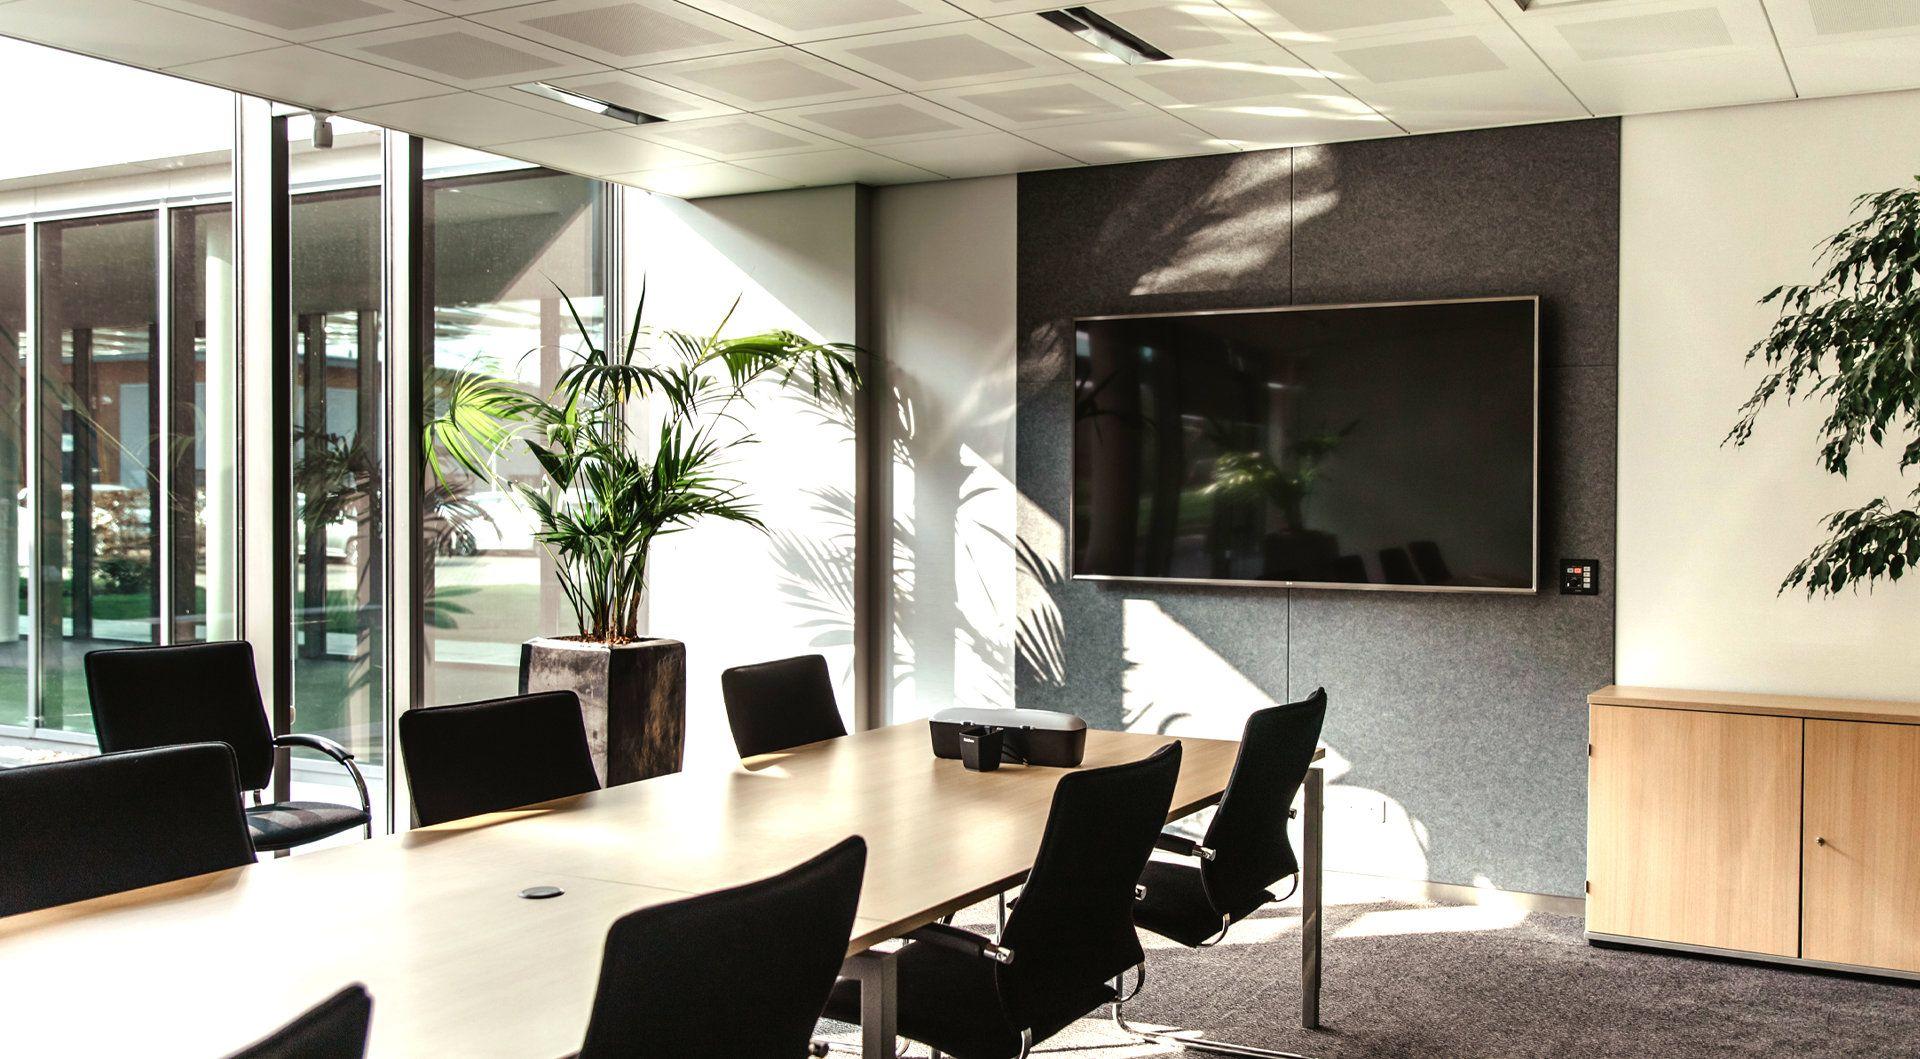 Epson EB-725Wi beamer/projector Plafondgemonteerde projector 4000 ANSI lumens 3LCD WXGA (1280x800) Wit - Case studie de vries